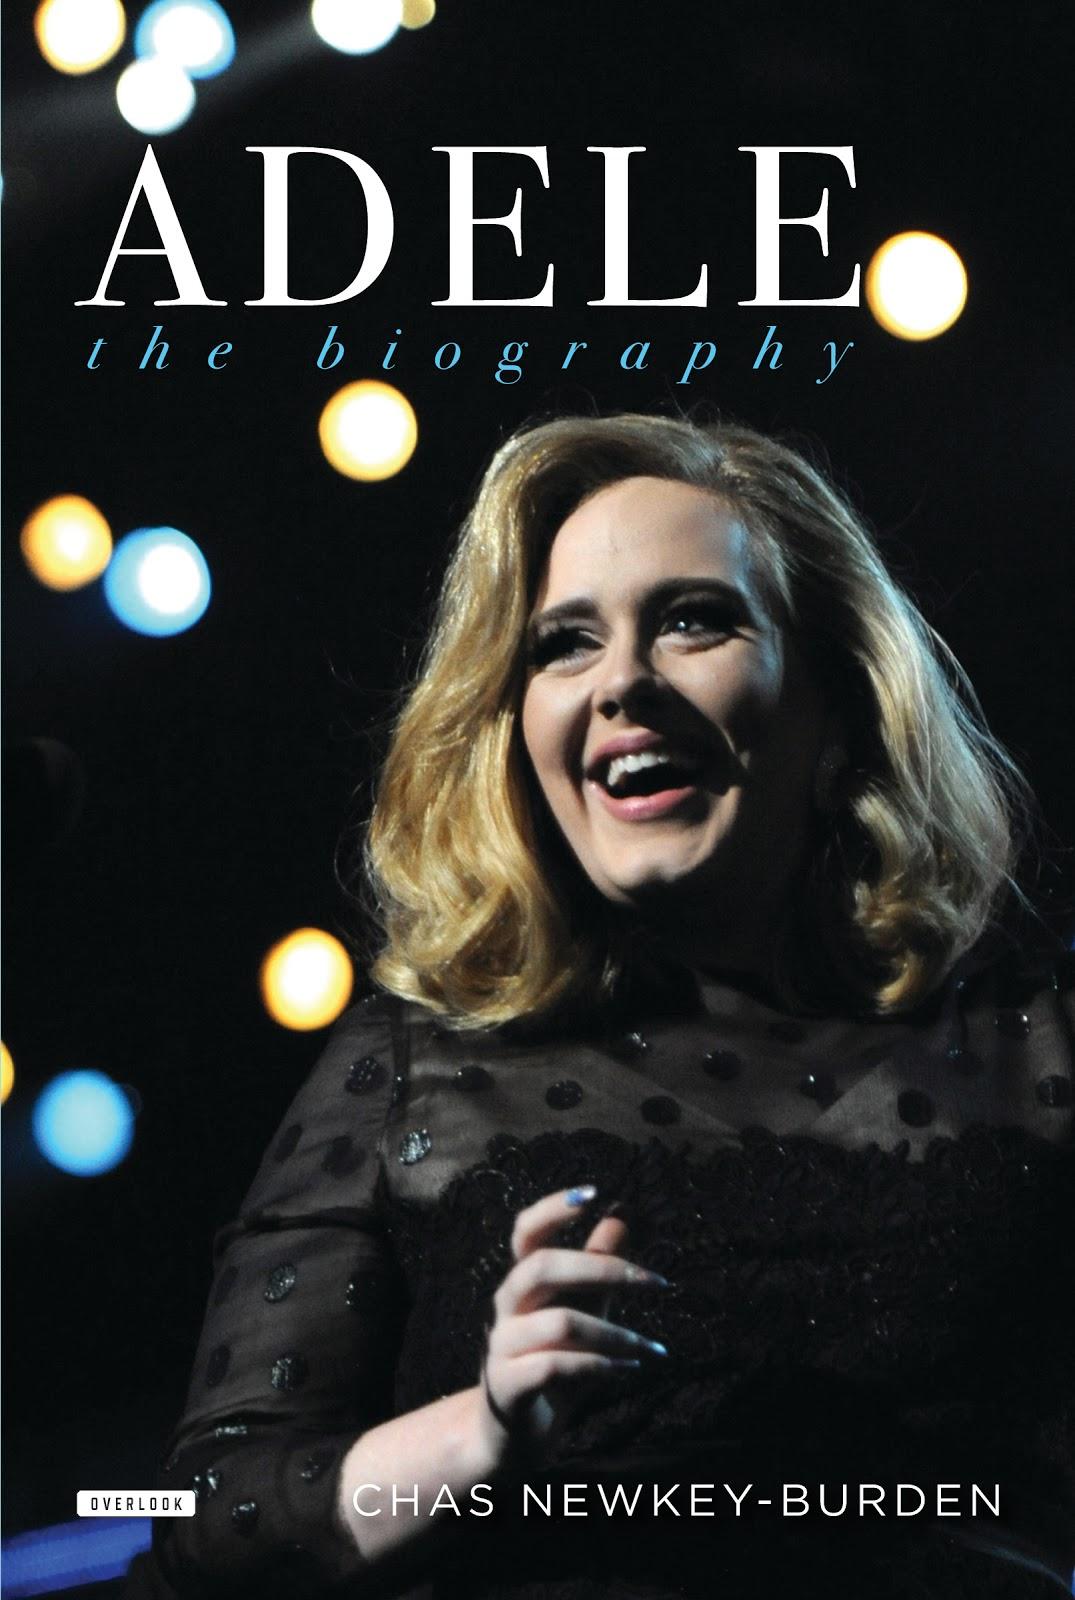 http://2.bp.blogspot.com/-qpsu7zQn1mA/UKFOz6l8Y-I/AAAAAAAAERk/YOnXRkSBnKE/s1600/Adele+Cover.jpg